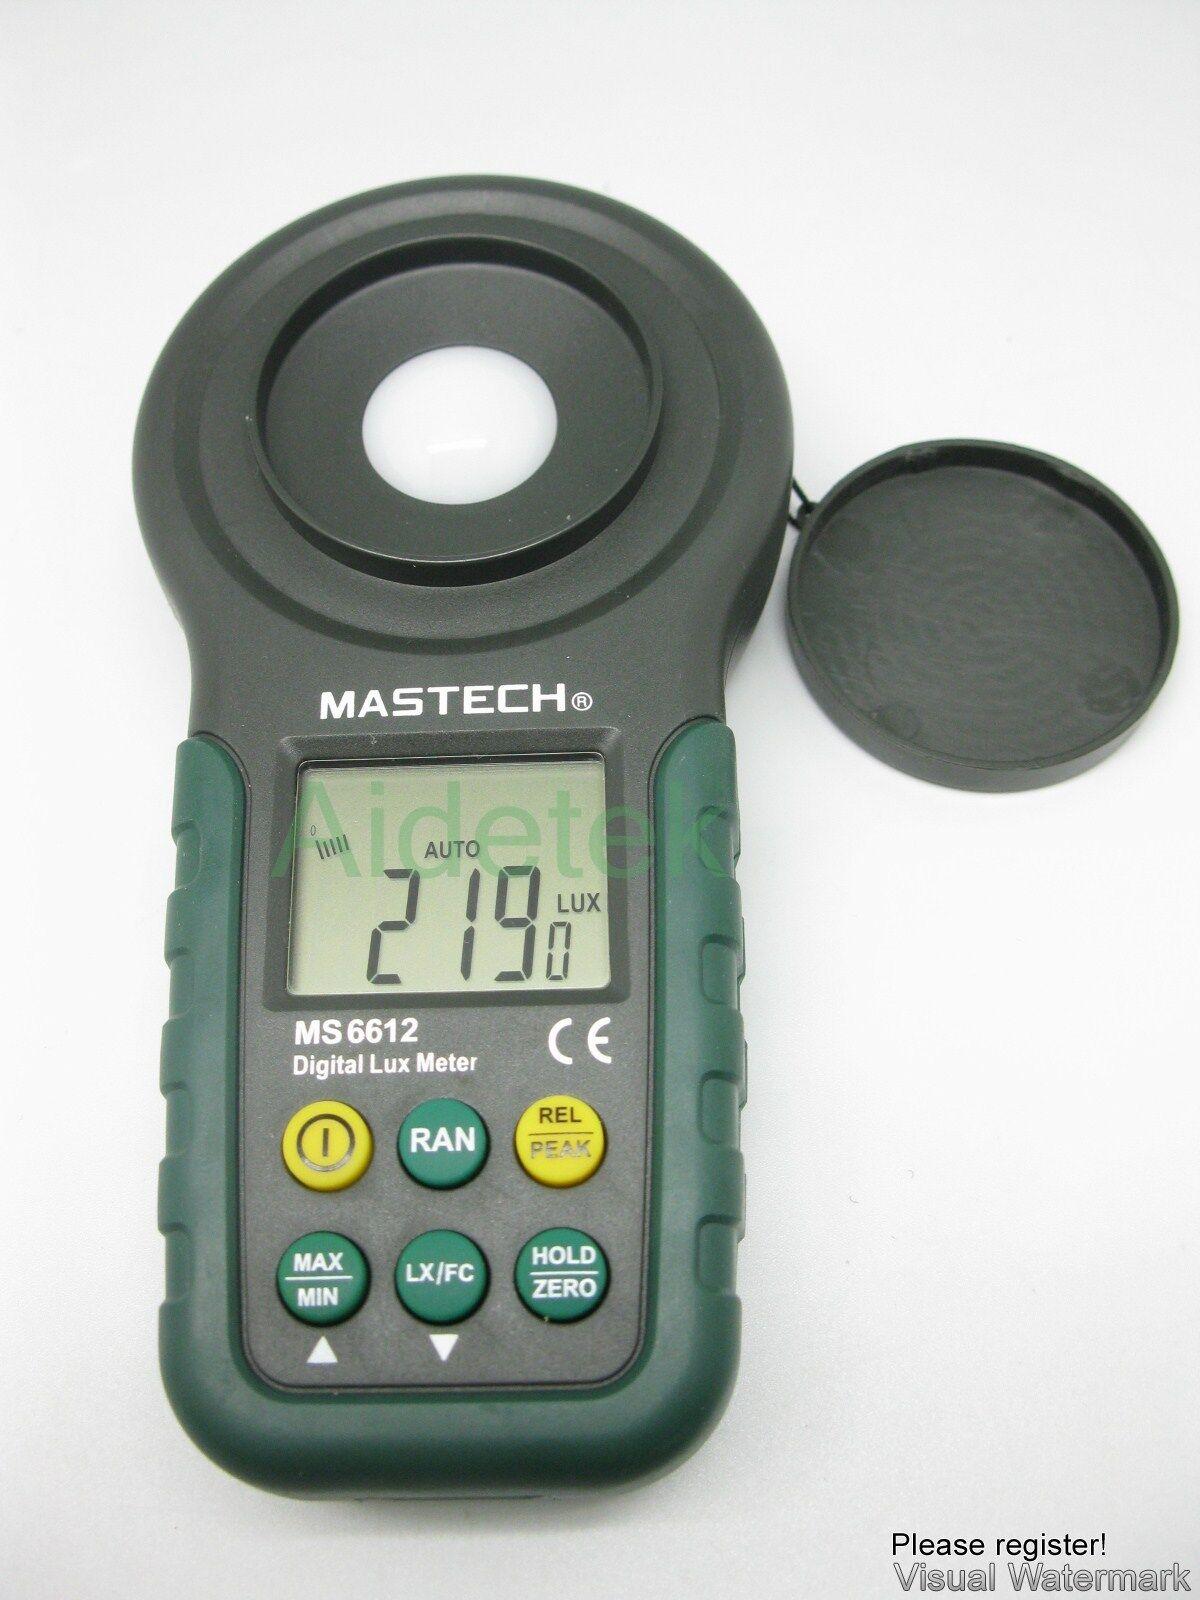 Mastech Pro Multi Function Luxmeter Ms6612 Light Meter Fo...